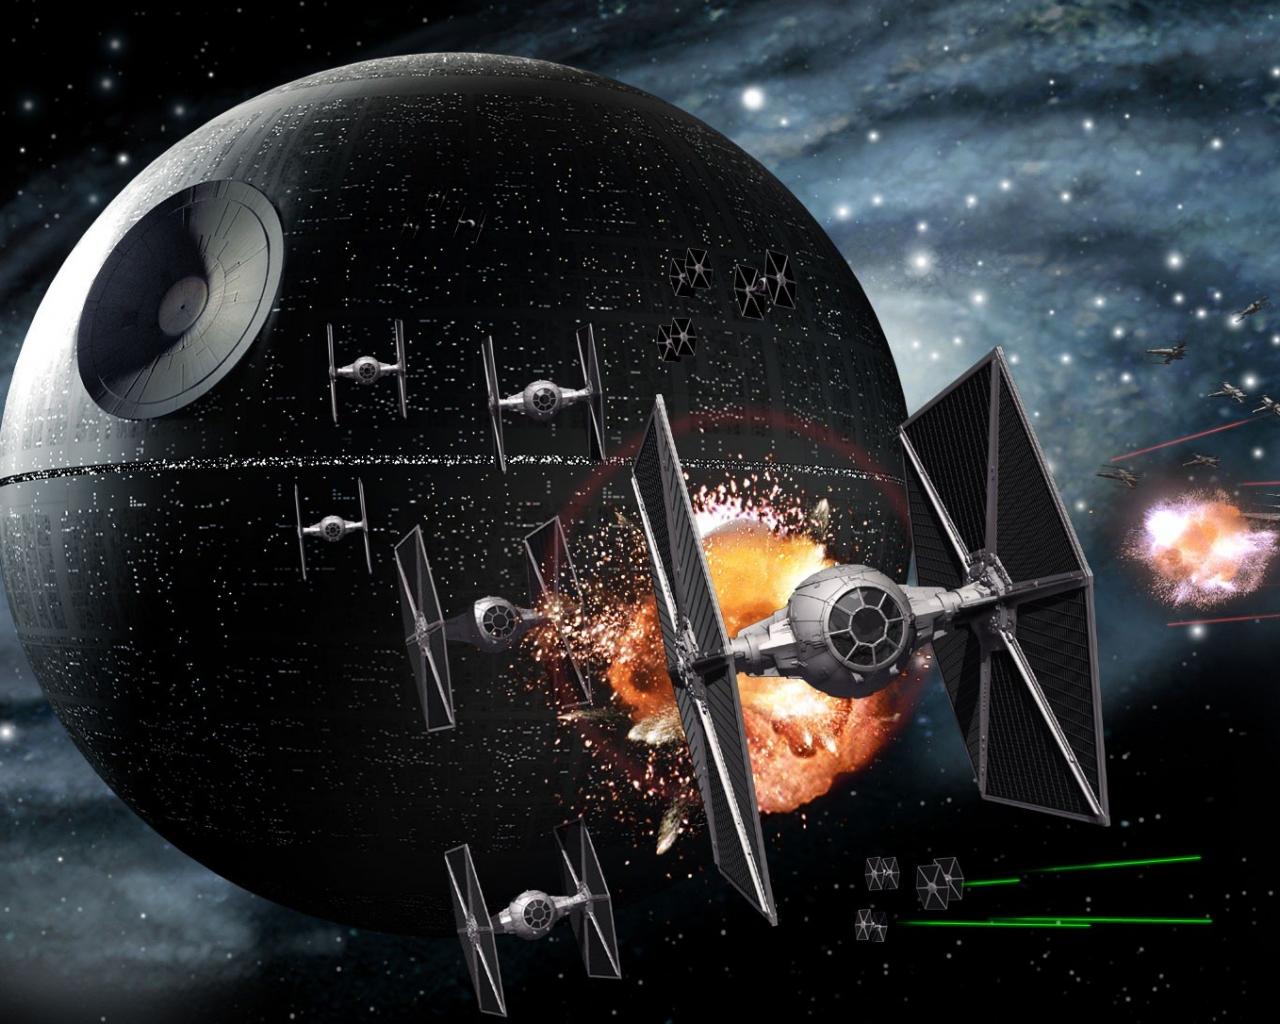 Free Download Star Wars Hd Desktop Wallpapers New Hd Wallpapers